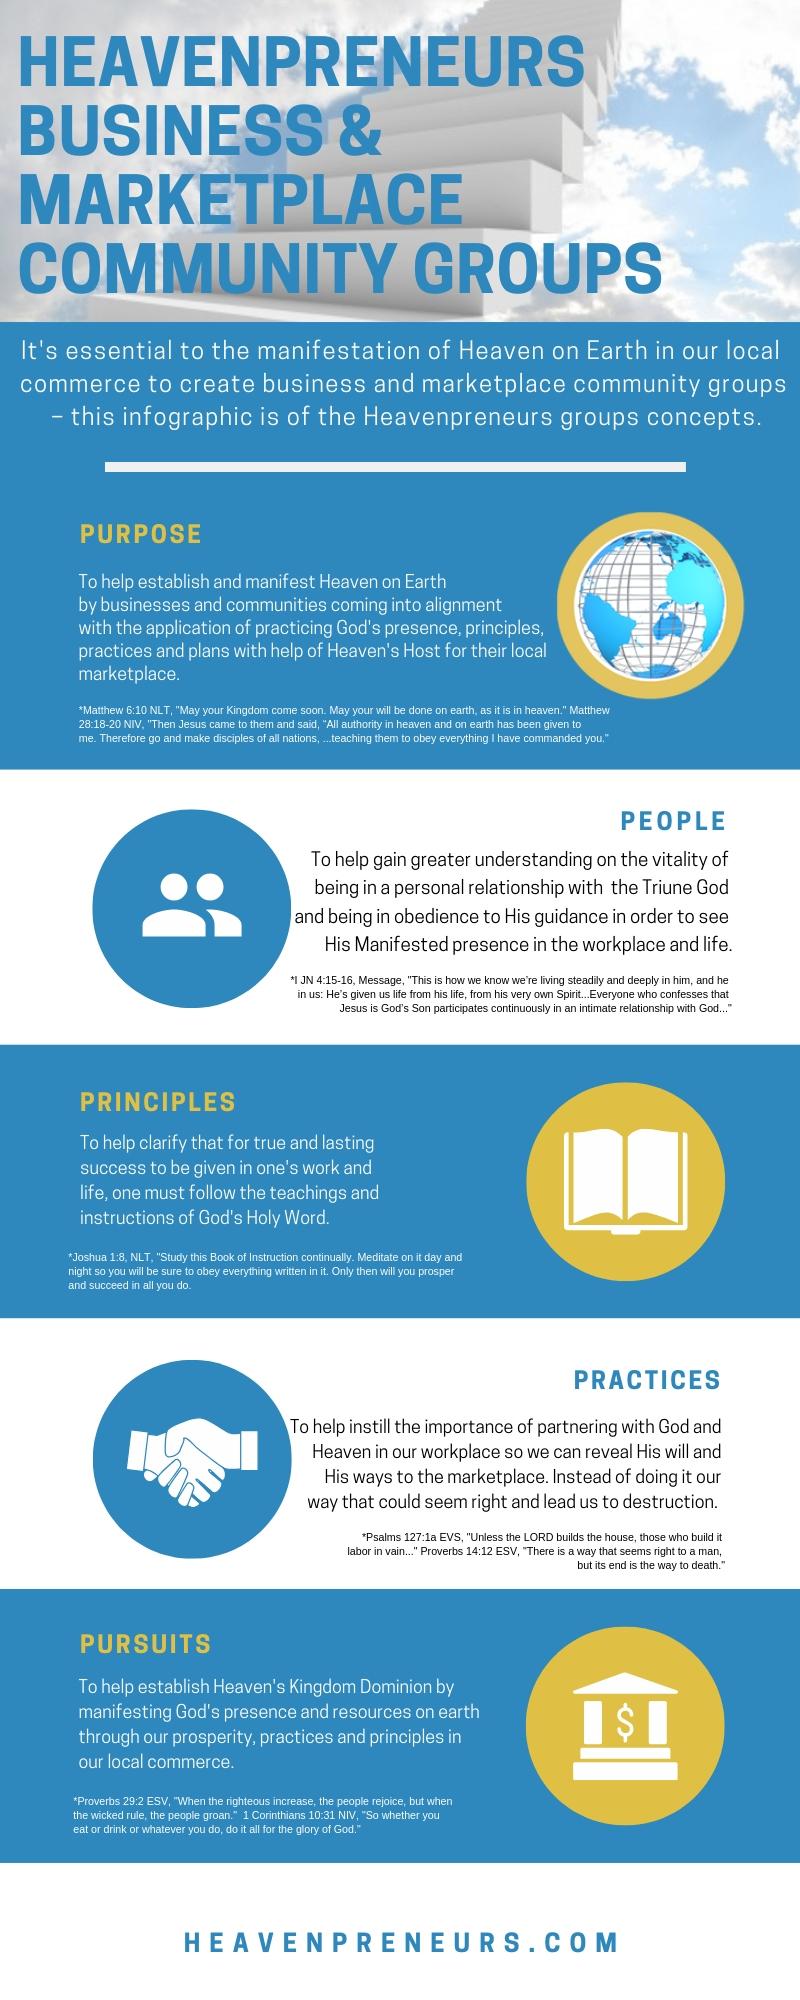 Heavenpreneurs Business & Community Groups